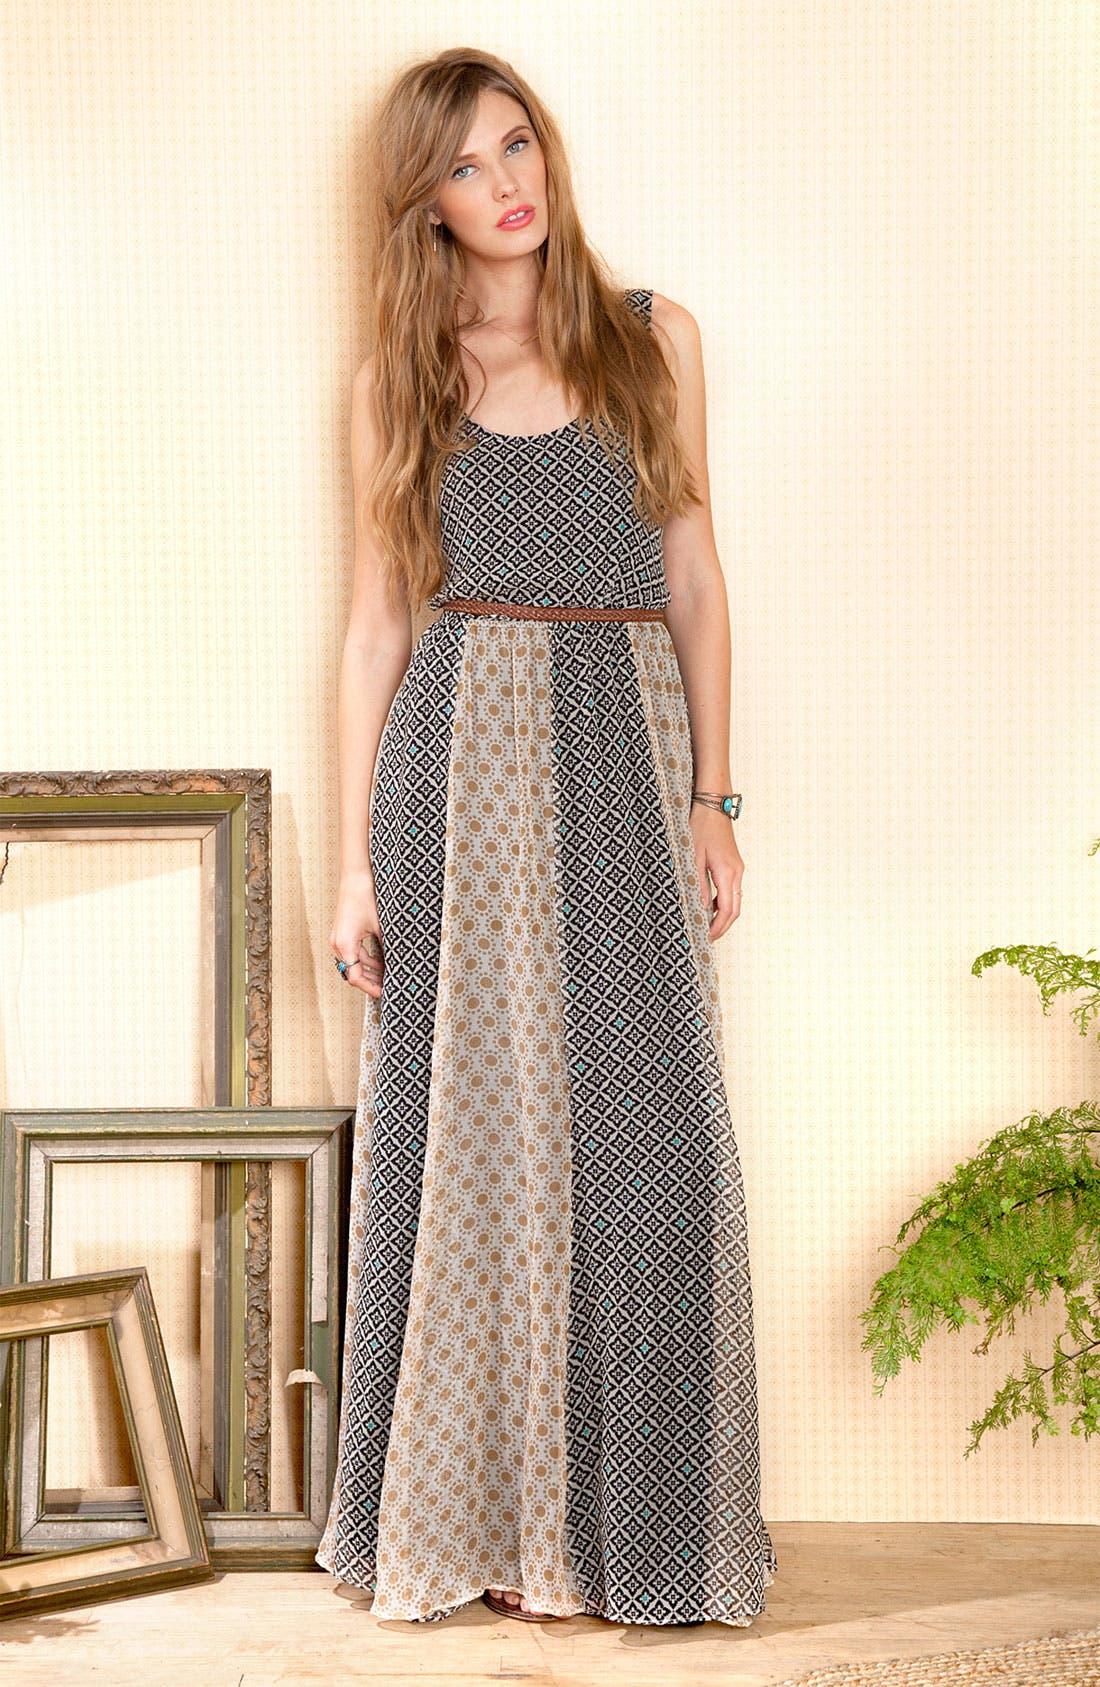 Main Image - Ella Moss Dress & Accessories